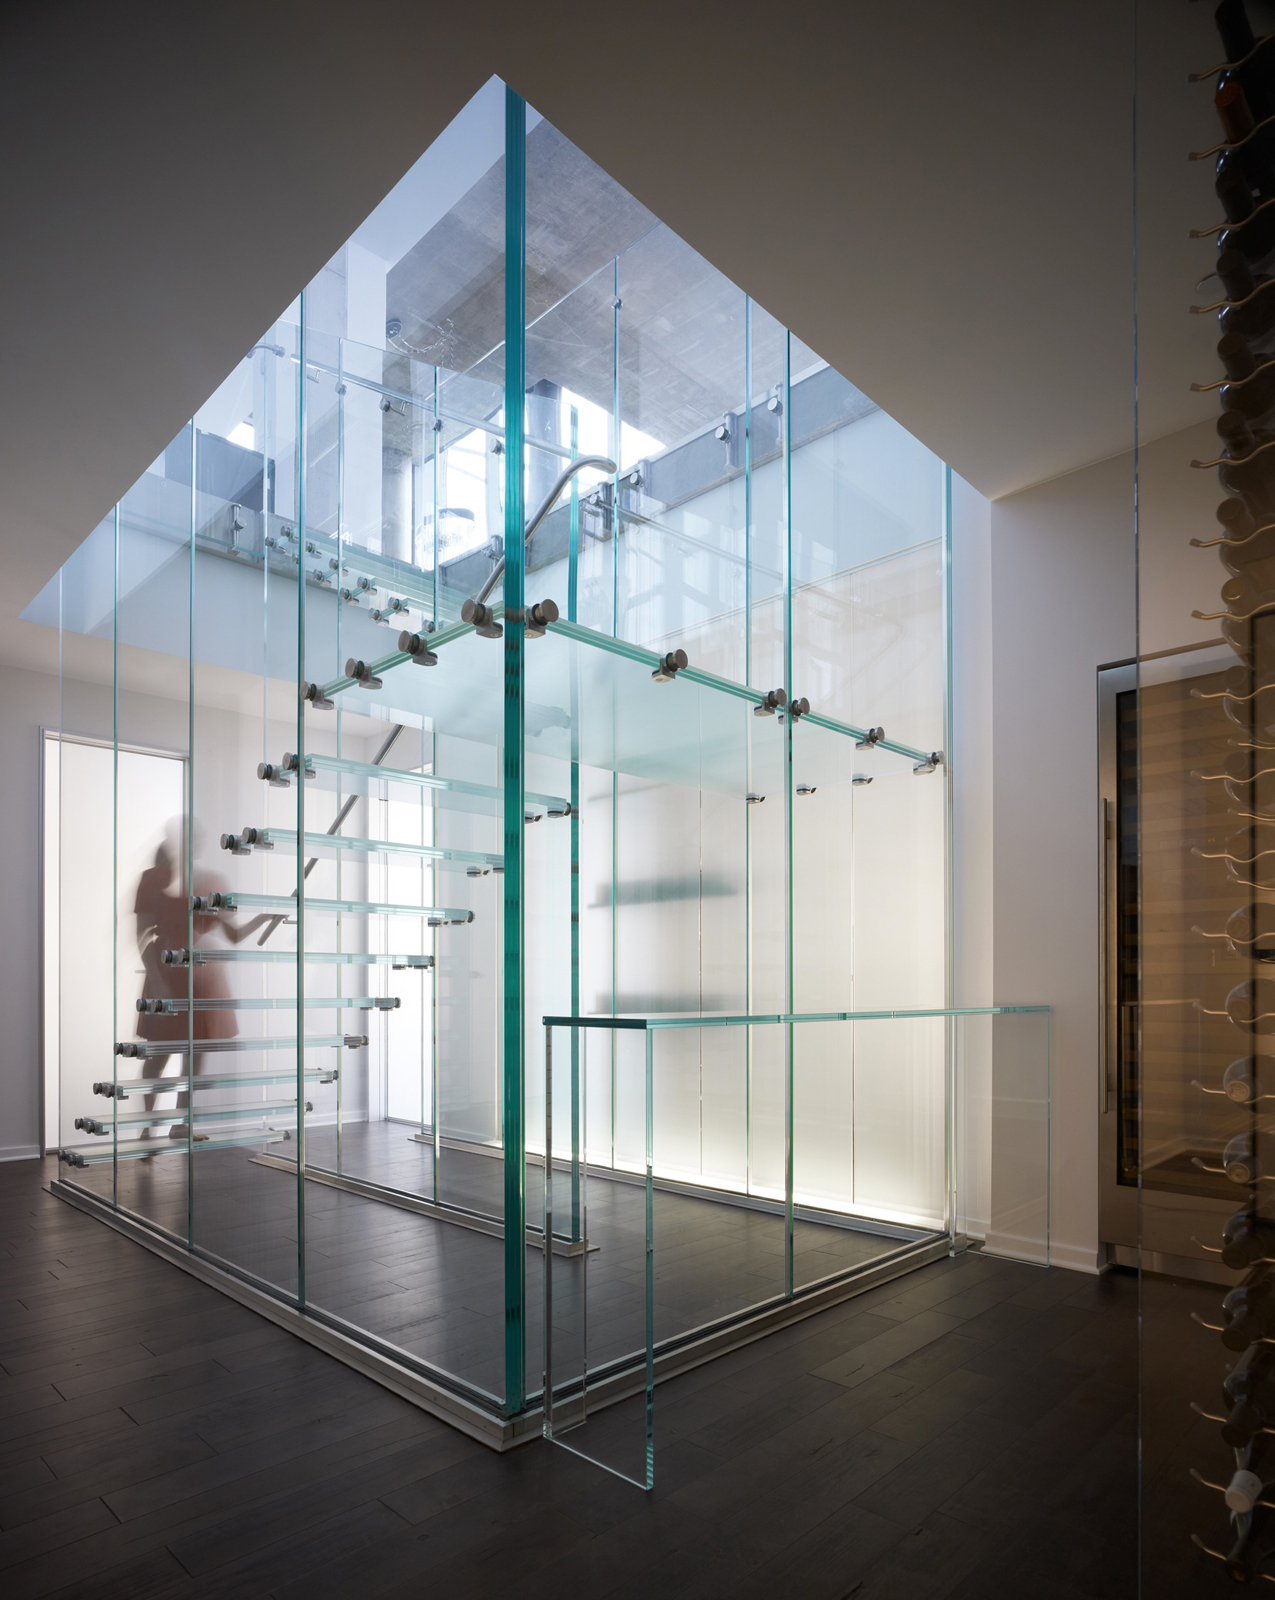 Thomas Roszak Architecture